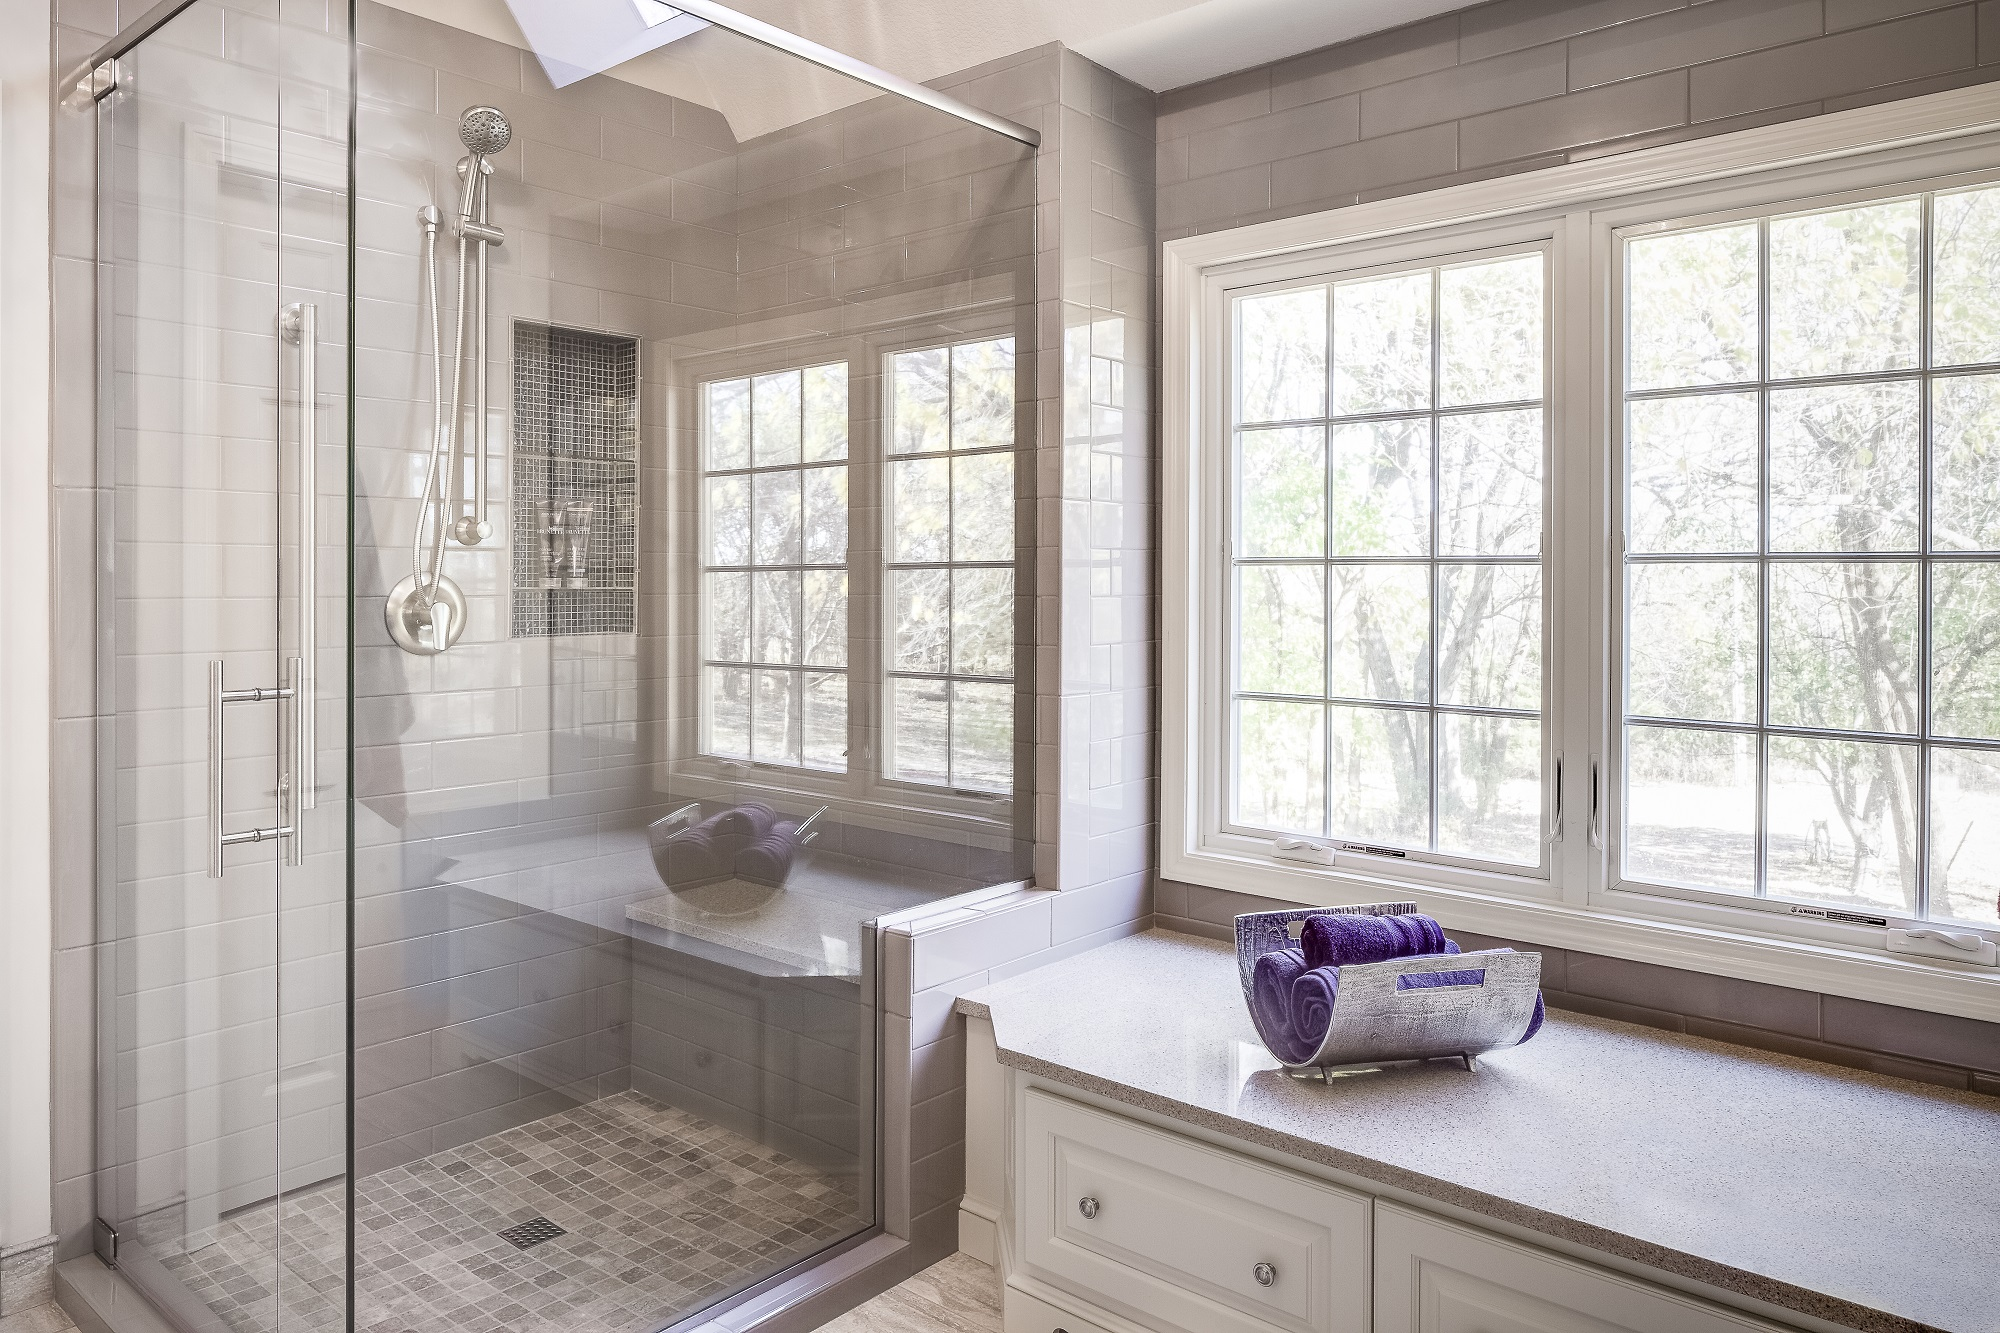 Bathroom Remodel Design Connection Inc Kansas City Interior Designer